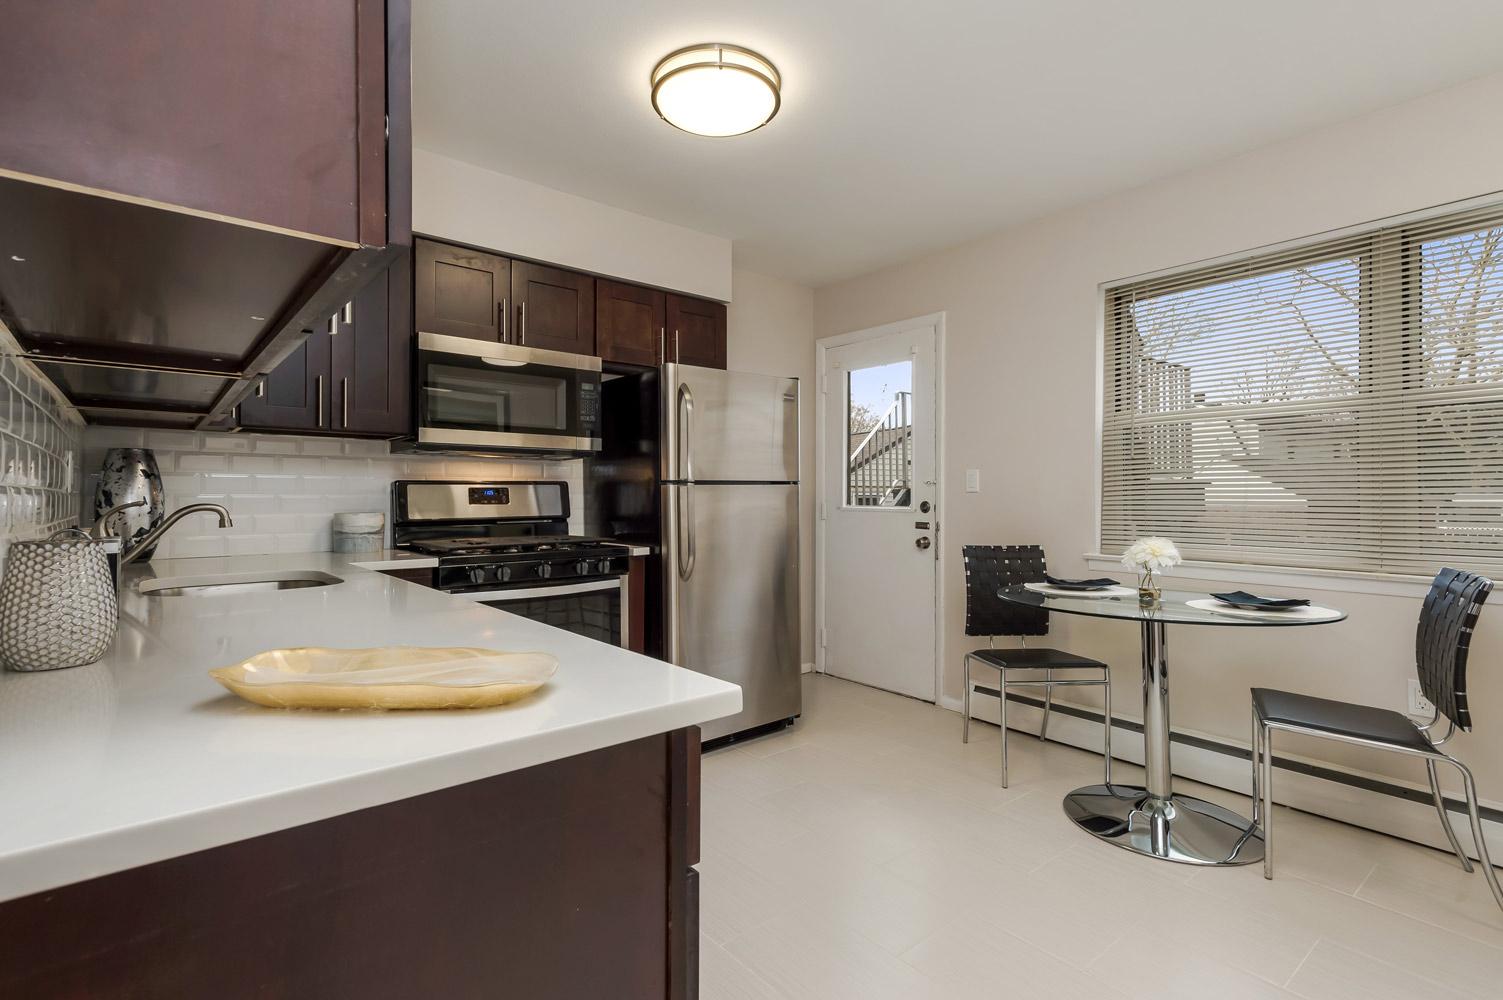 Interior Kitchen at Grandview Gardens Apartments in Edison, New Jersey